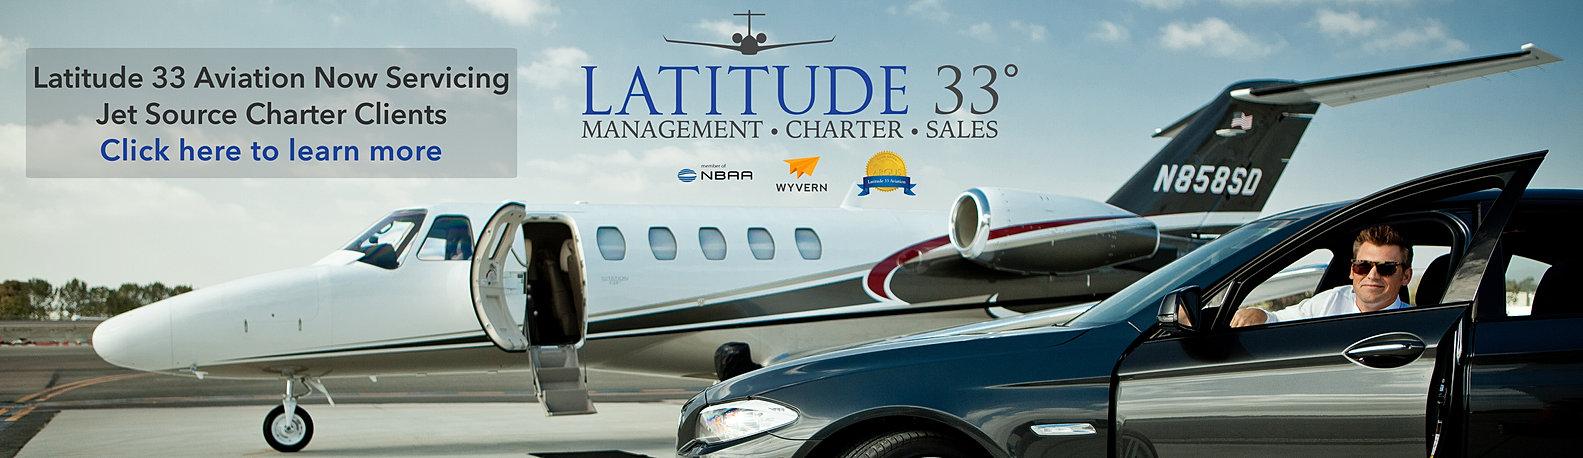 San Diego FullService FBO Private Jet Charter Maintenance Avionics